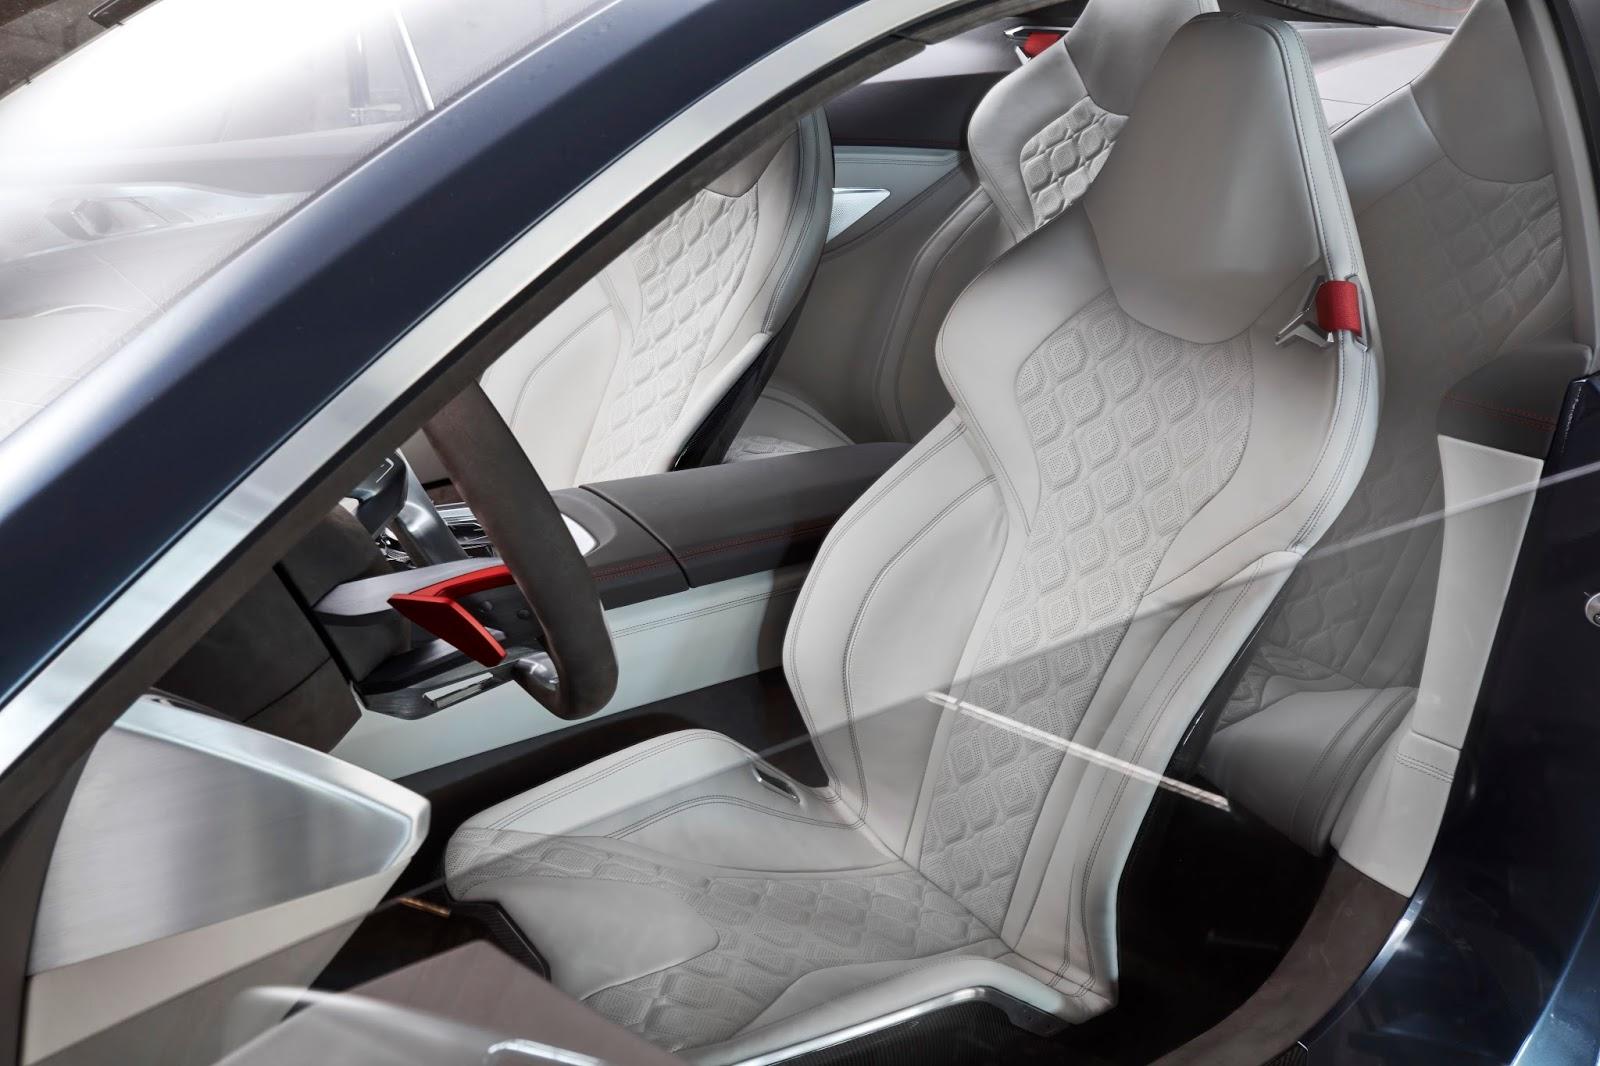 P90261136 highRes bmw concept 8 series252812529 Η BMW Σειρά 8 Coupe είναι η πεμπτουσία των μελλοντικών σπορ αυτοκινήτων BMW, BMW 8, BMW Concept, BMW Concept 8 Series, COUPE, dream car